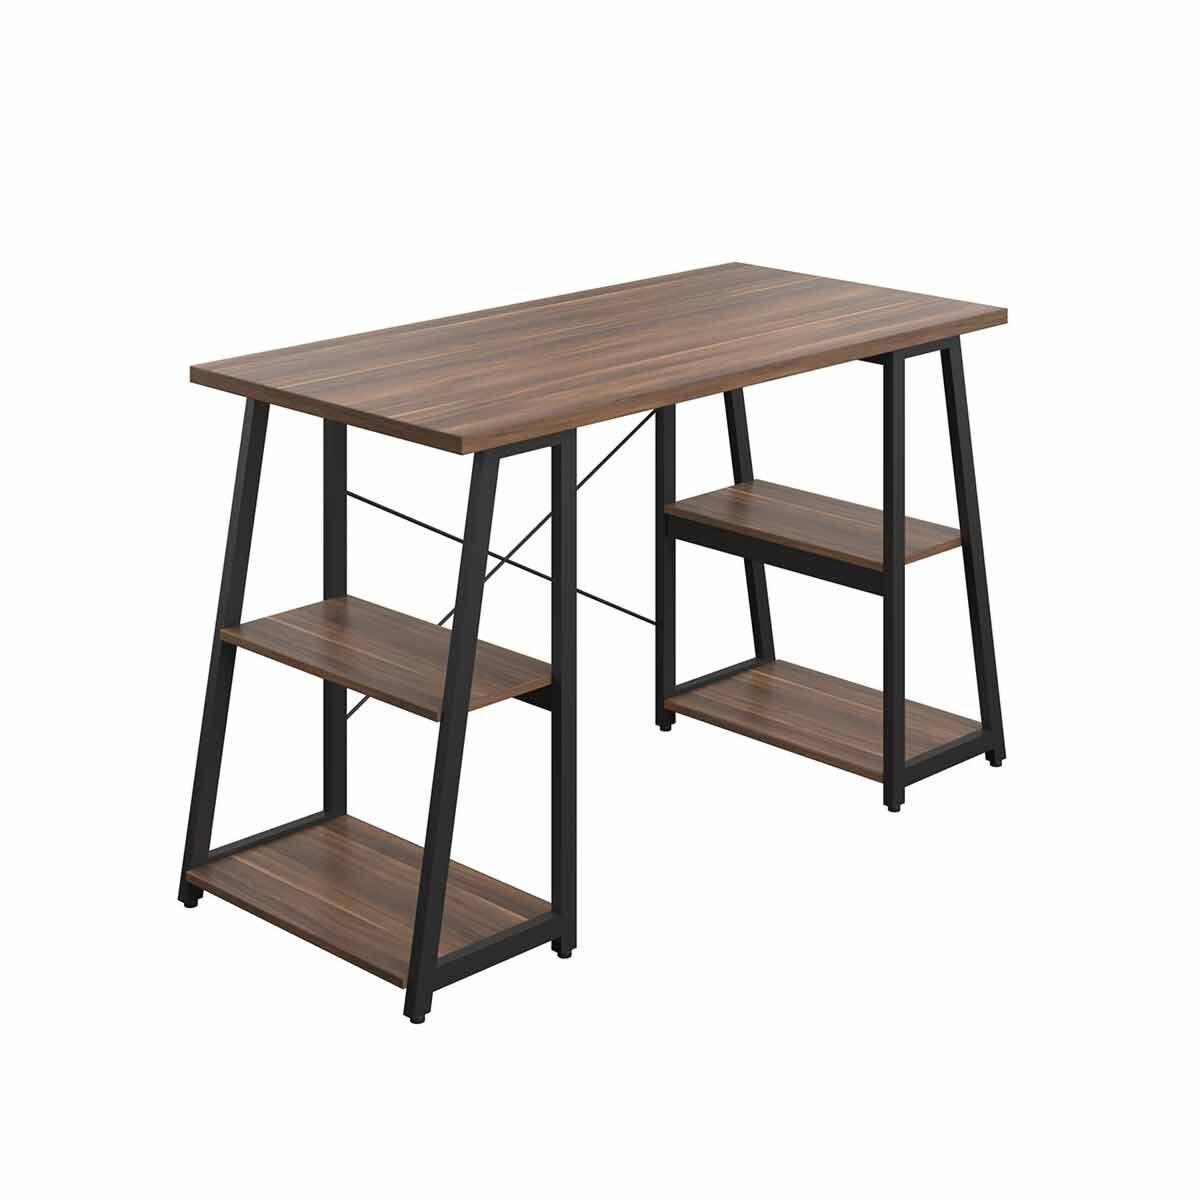 TC Office SOHO Home Working Desk with A-Frame Shelves Walnut